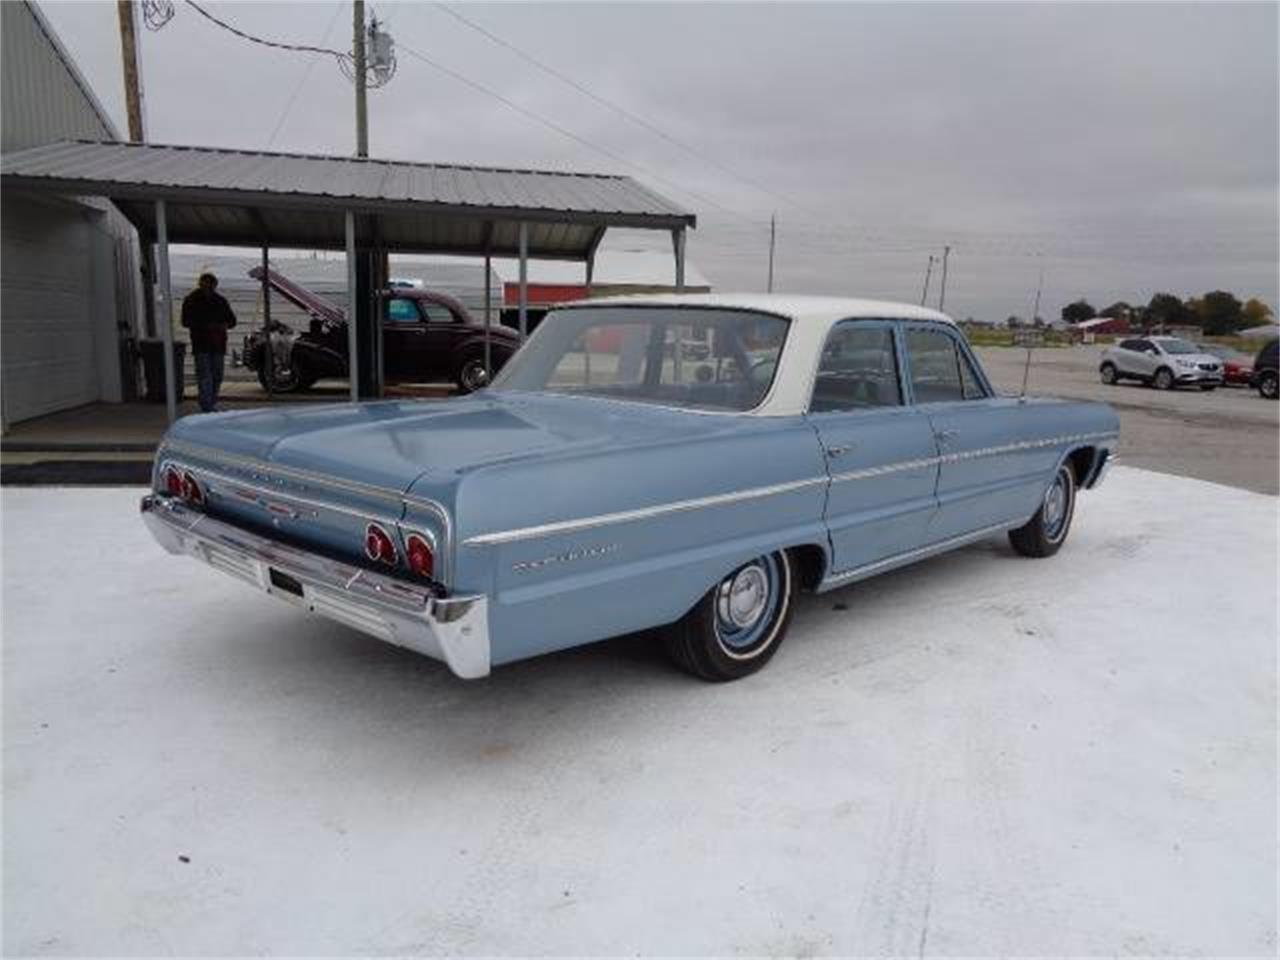 1964 Chevrolet Bel Air (CC-1299965) for sale in Staunton, Illinois